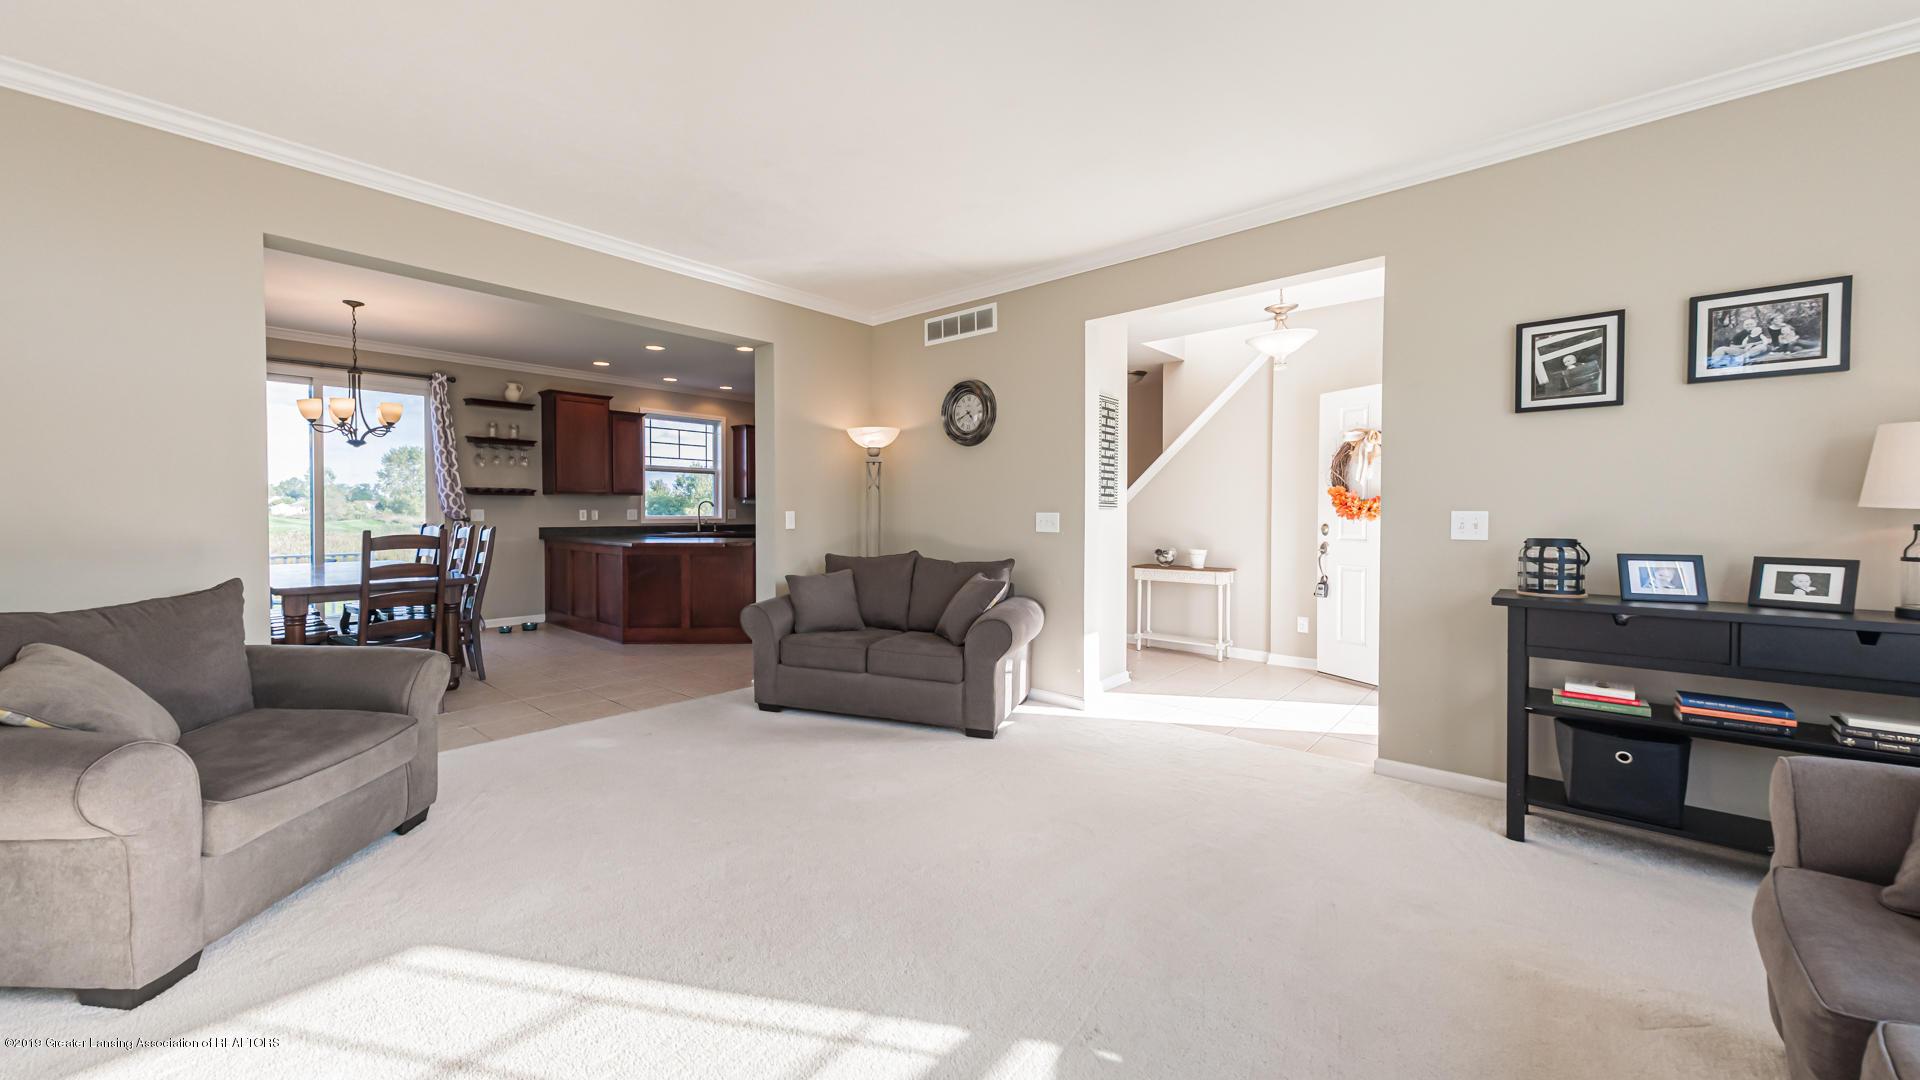 3742 Shearwater Ln - living room - 8